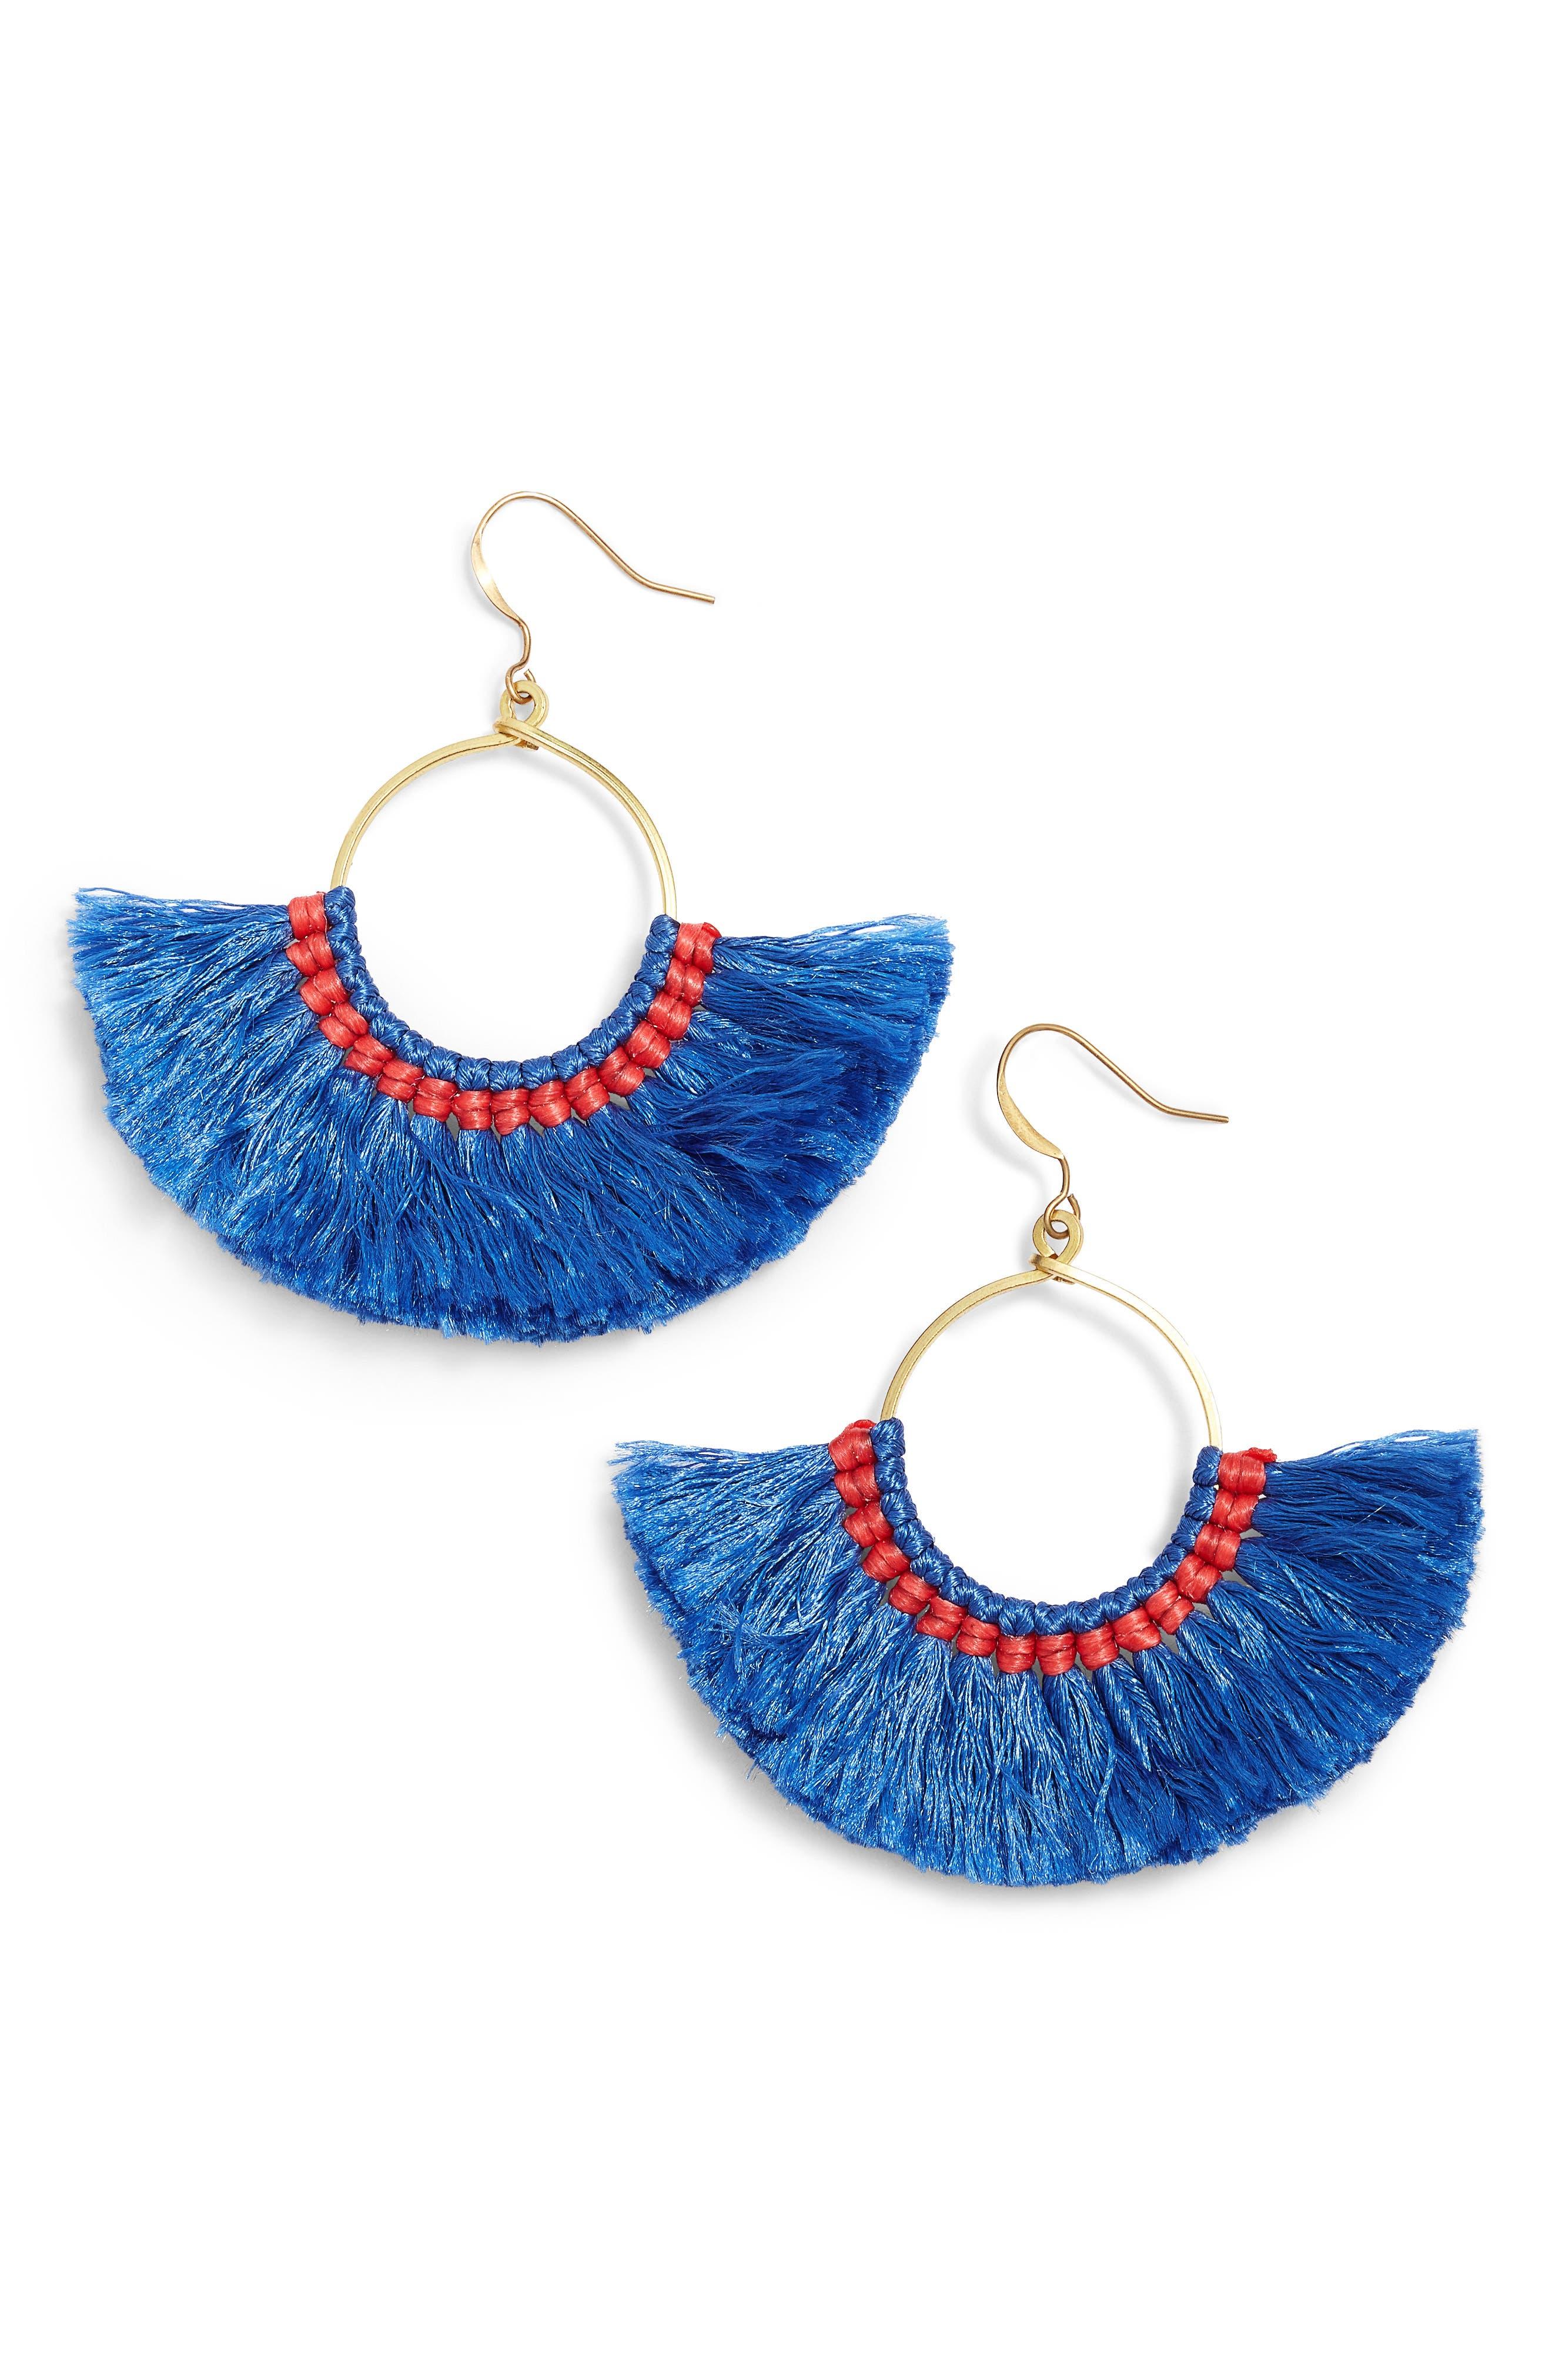 Alternate Image 1 Selected - Nakamol Design Cotton Fan Earrings